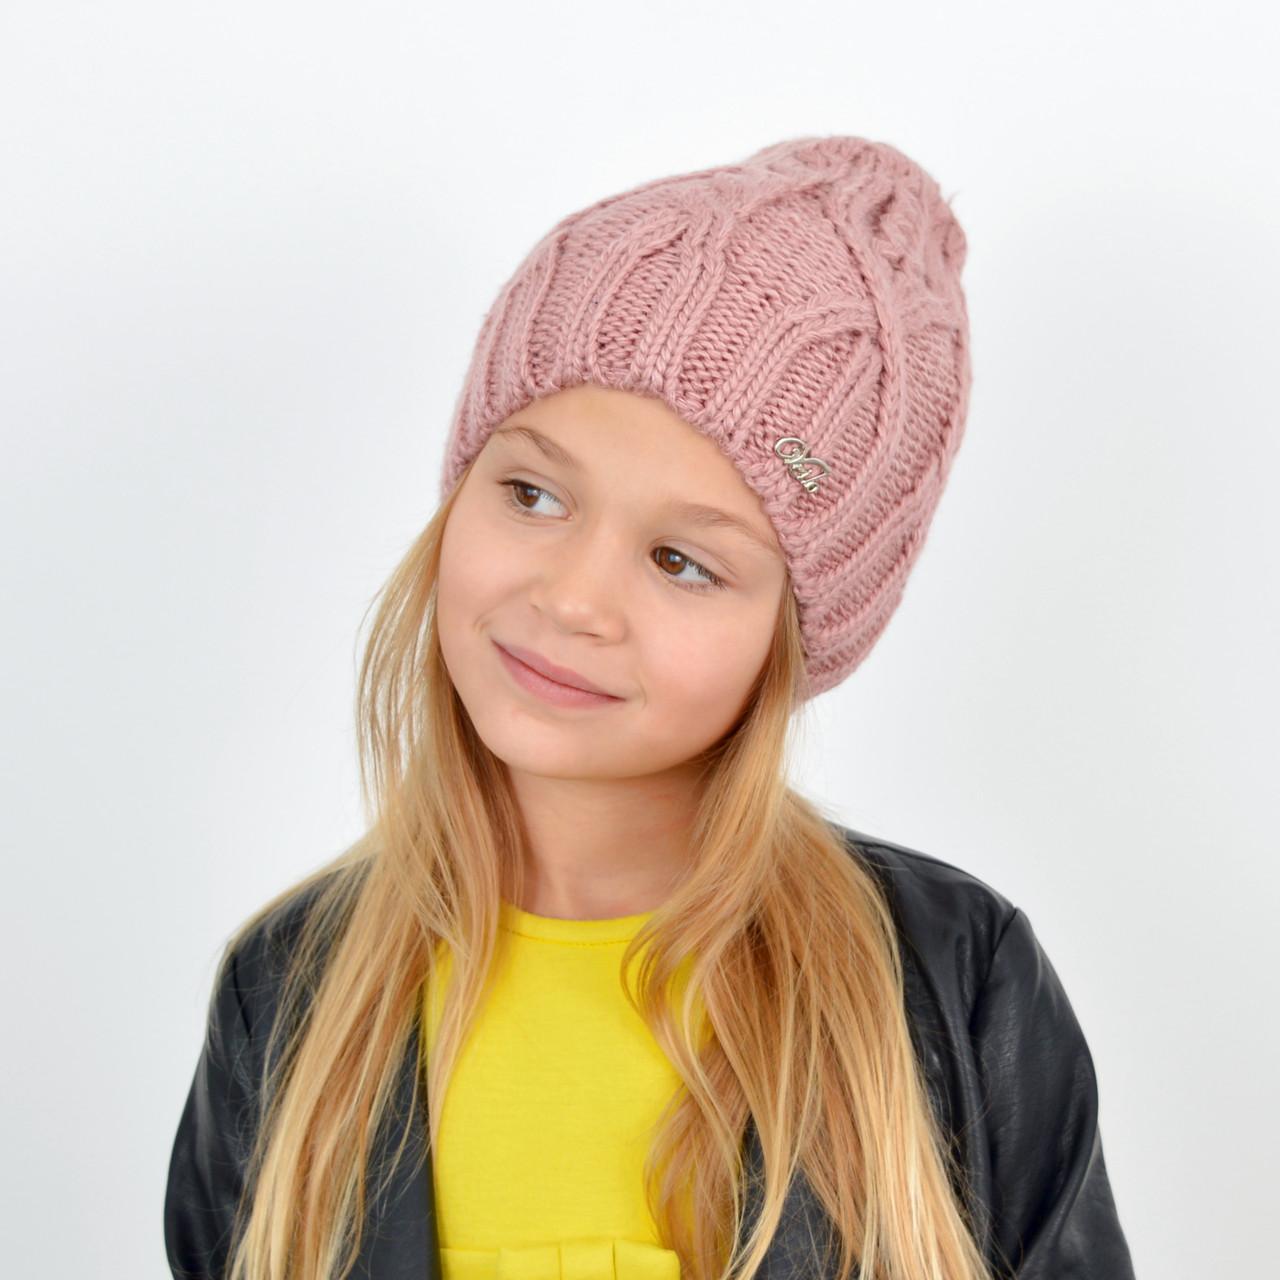 Детская вязаная шапка 3360 Пыльная роза